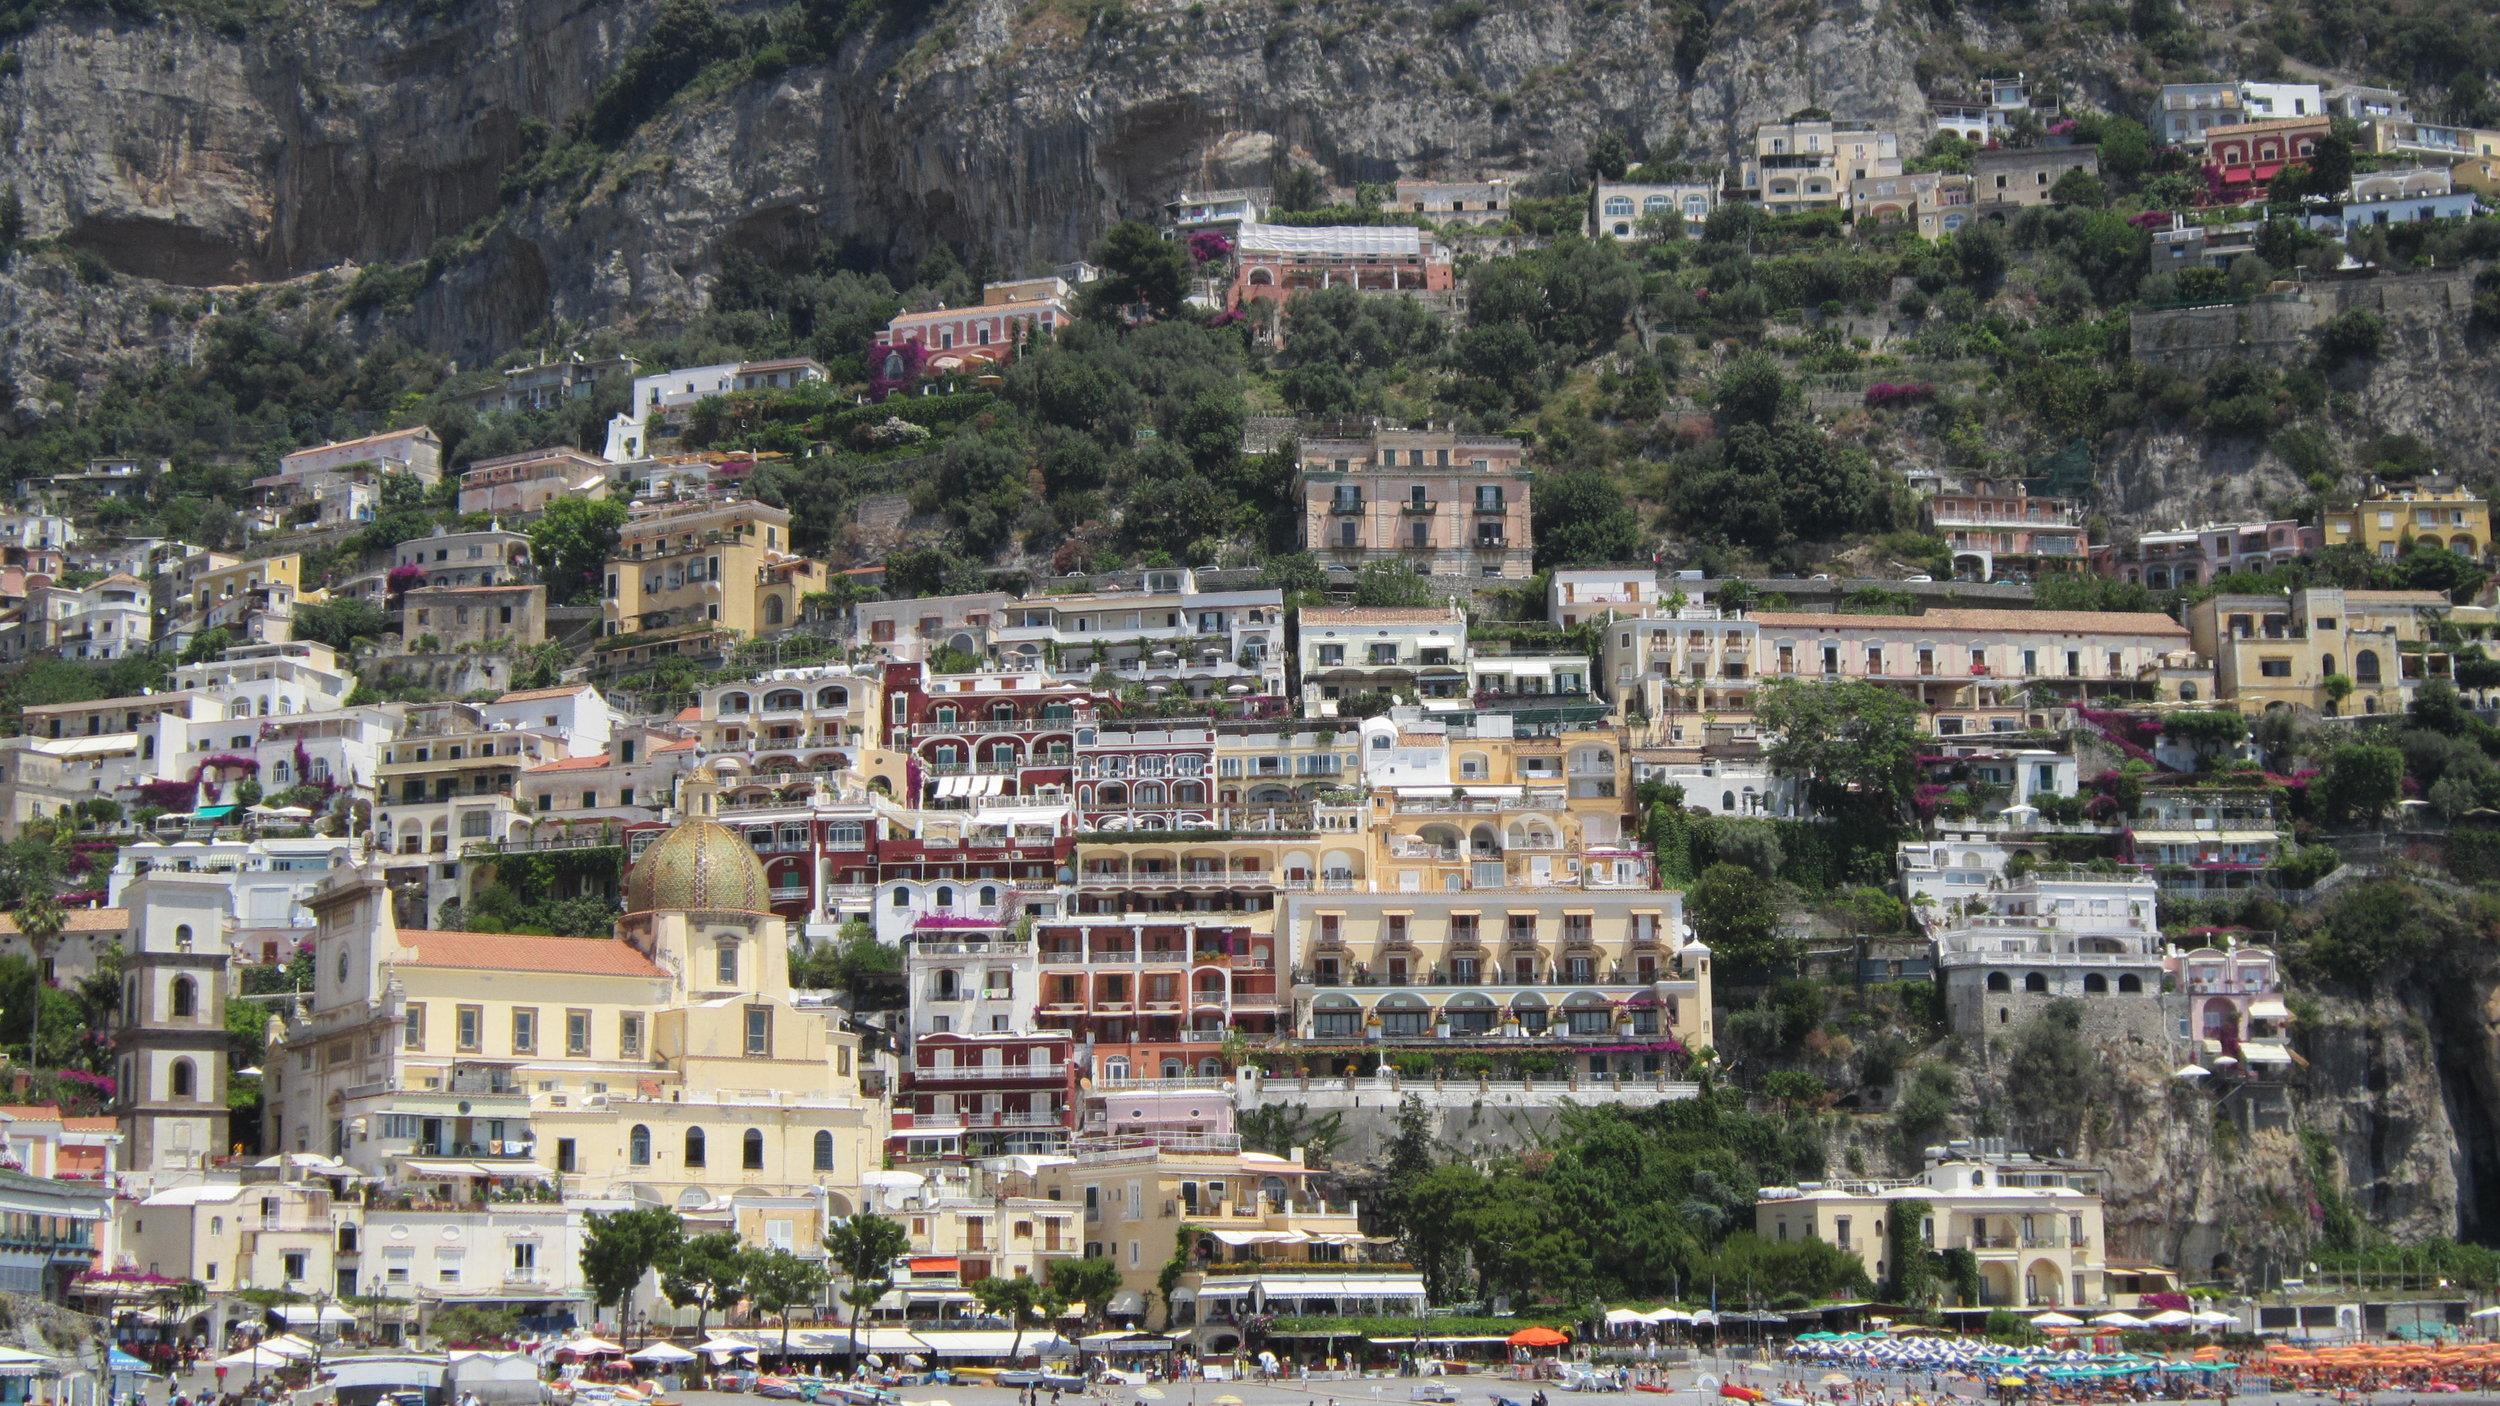 Parting shot of Positano as we head back to Capri.